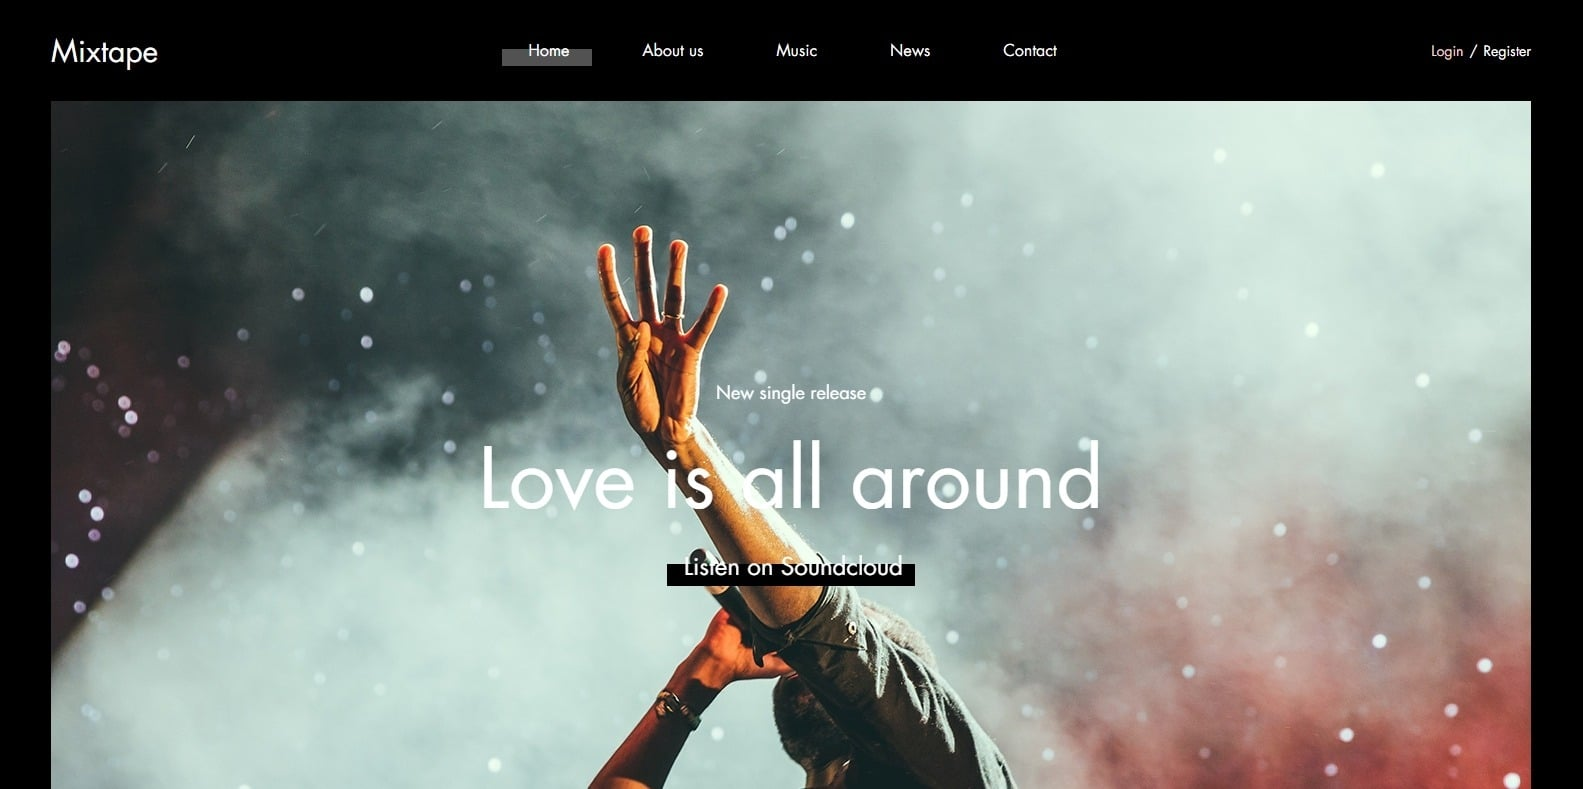 mixtape-html-free-website-template